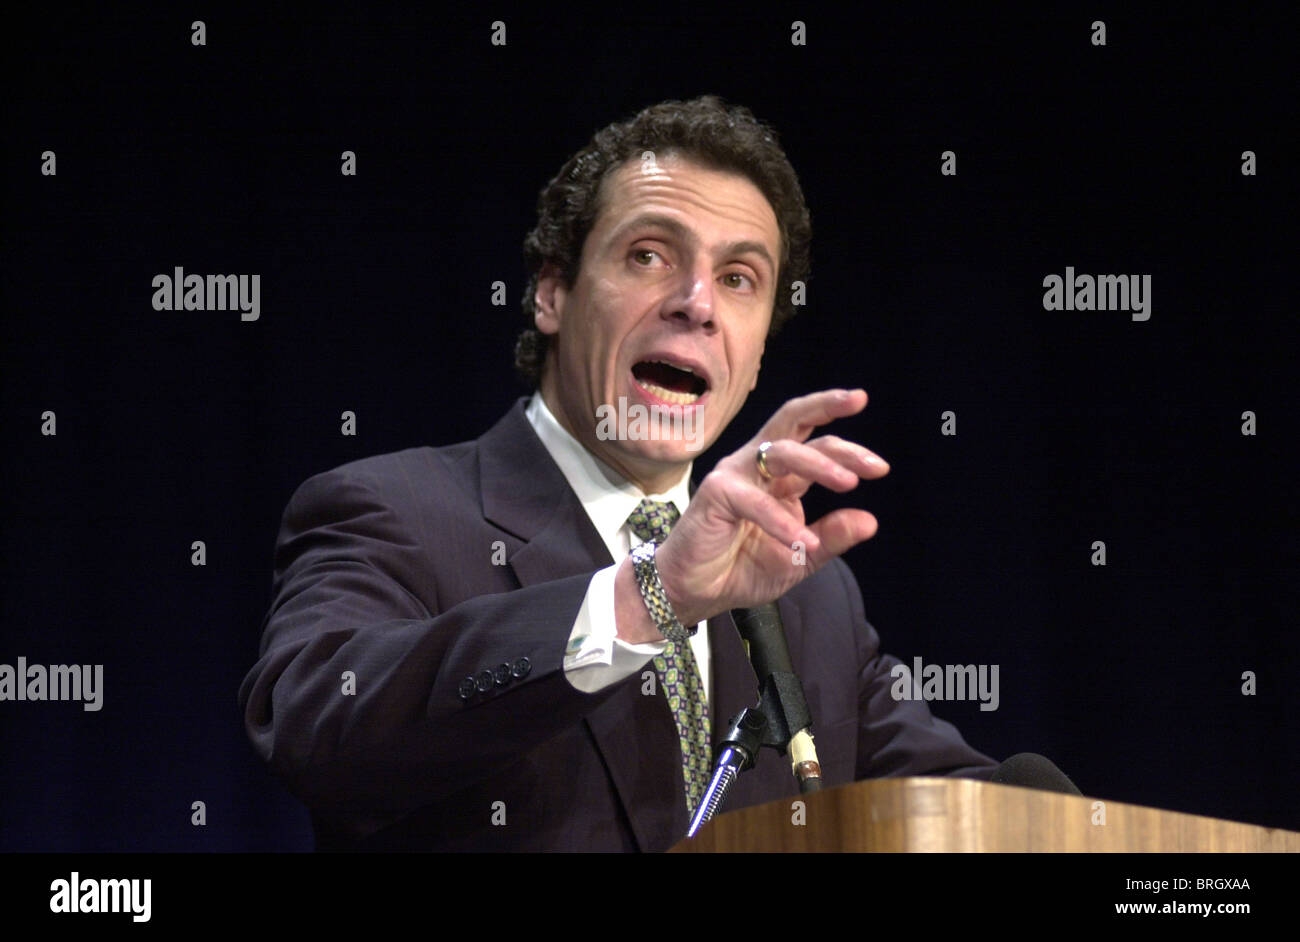 Andrew M. Cuomo, the Secretary of Housing and Urban Development speaks in Washington DC. Stock Photo